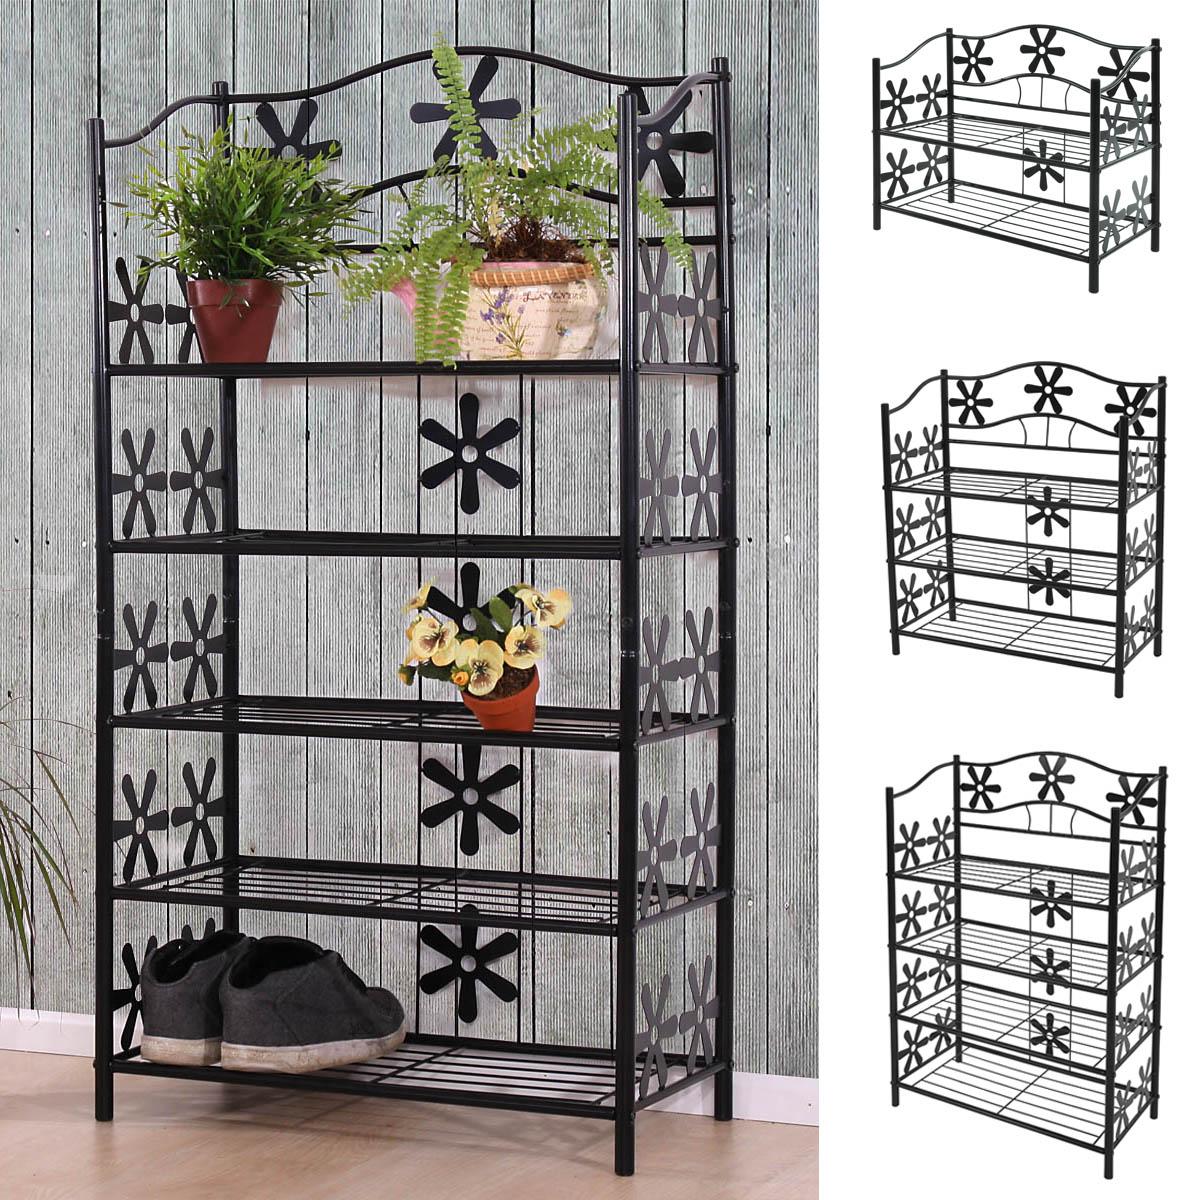 regal metall b cherregal schuhregal standregal genf h he. Black Bedroom Furniture Sets. Home Design Ideas